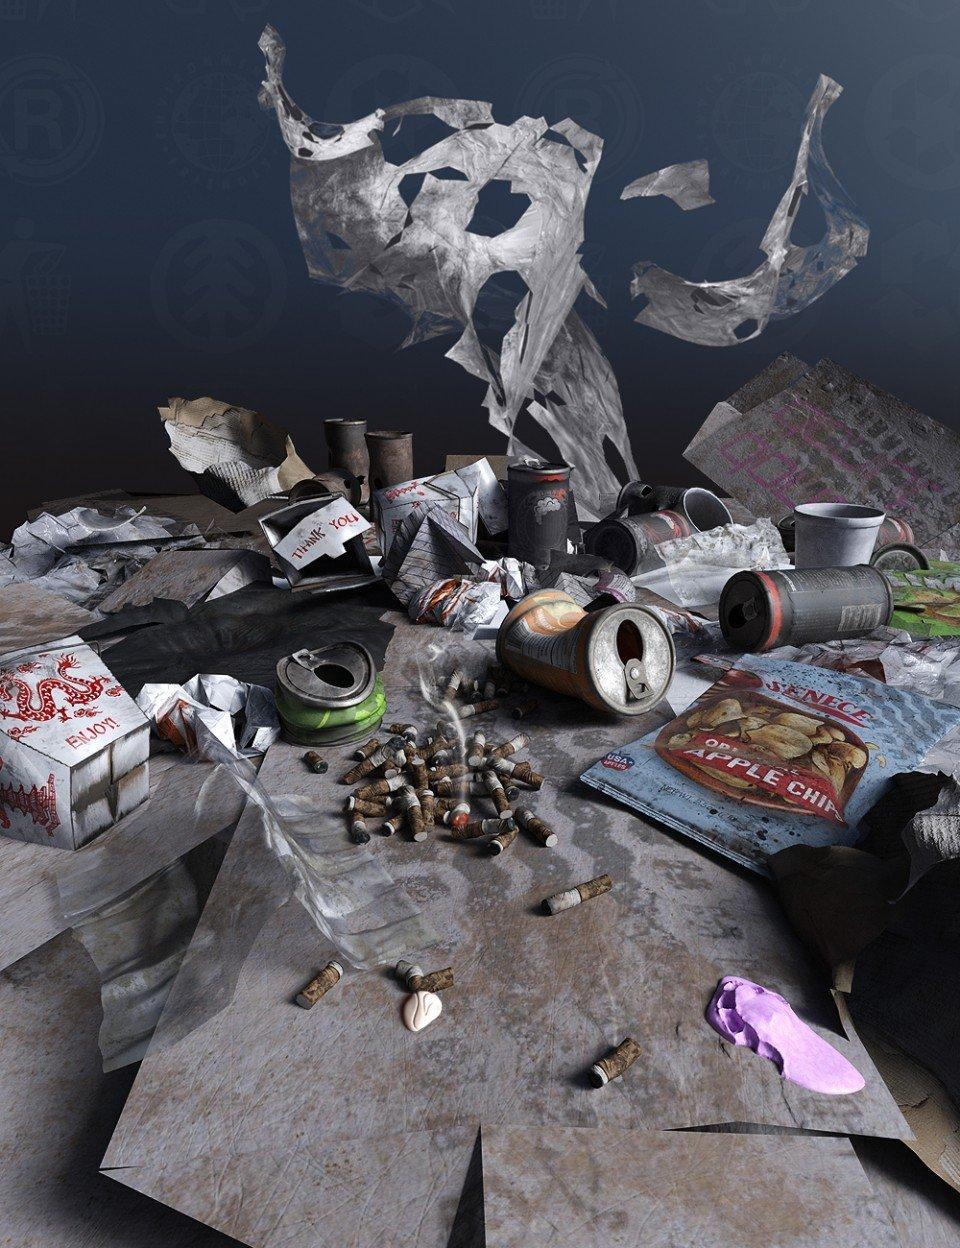 street trash collection 00 main daz3d